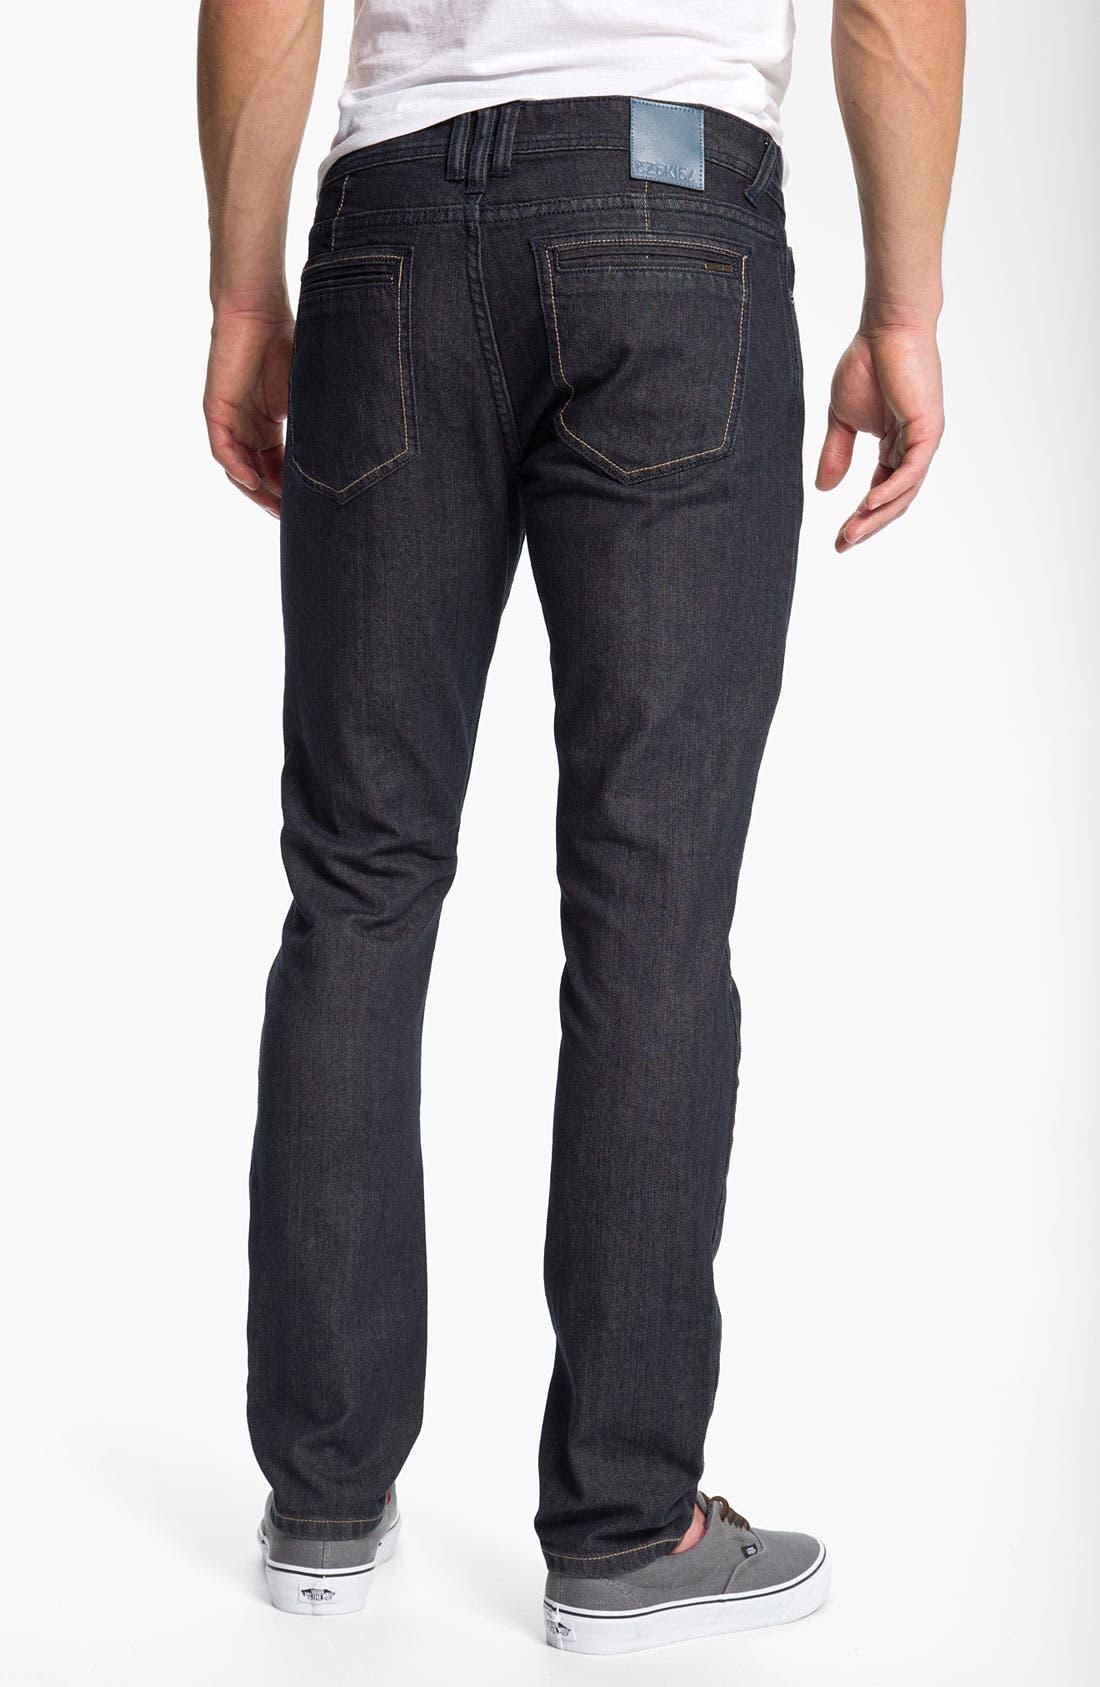 Alternate Image 1 Selected - Ezekiel 'Chopper 305' Slouchy Slim Fit Jeans (Light Raw Indigo)